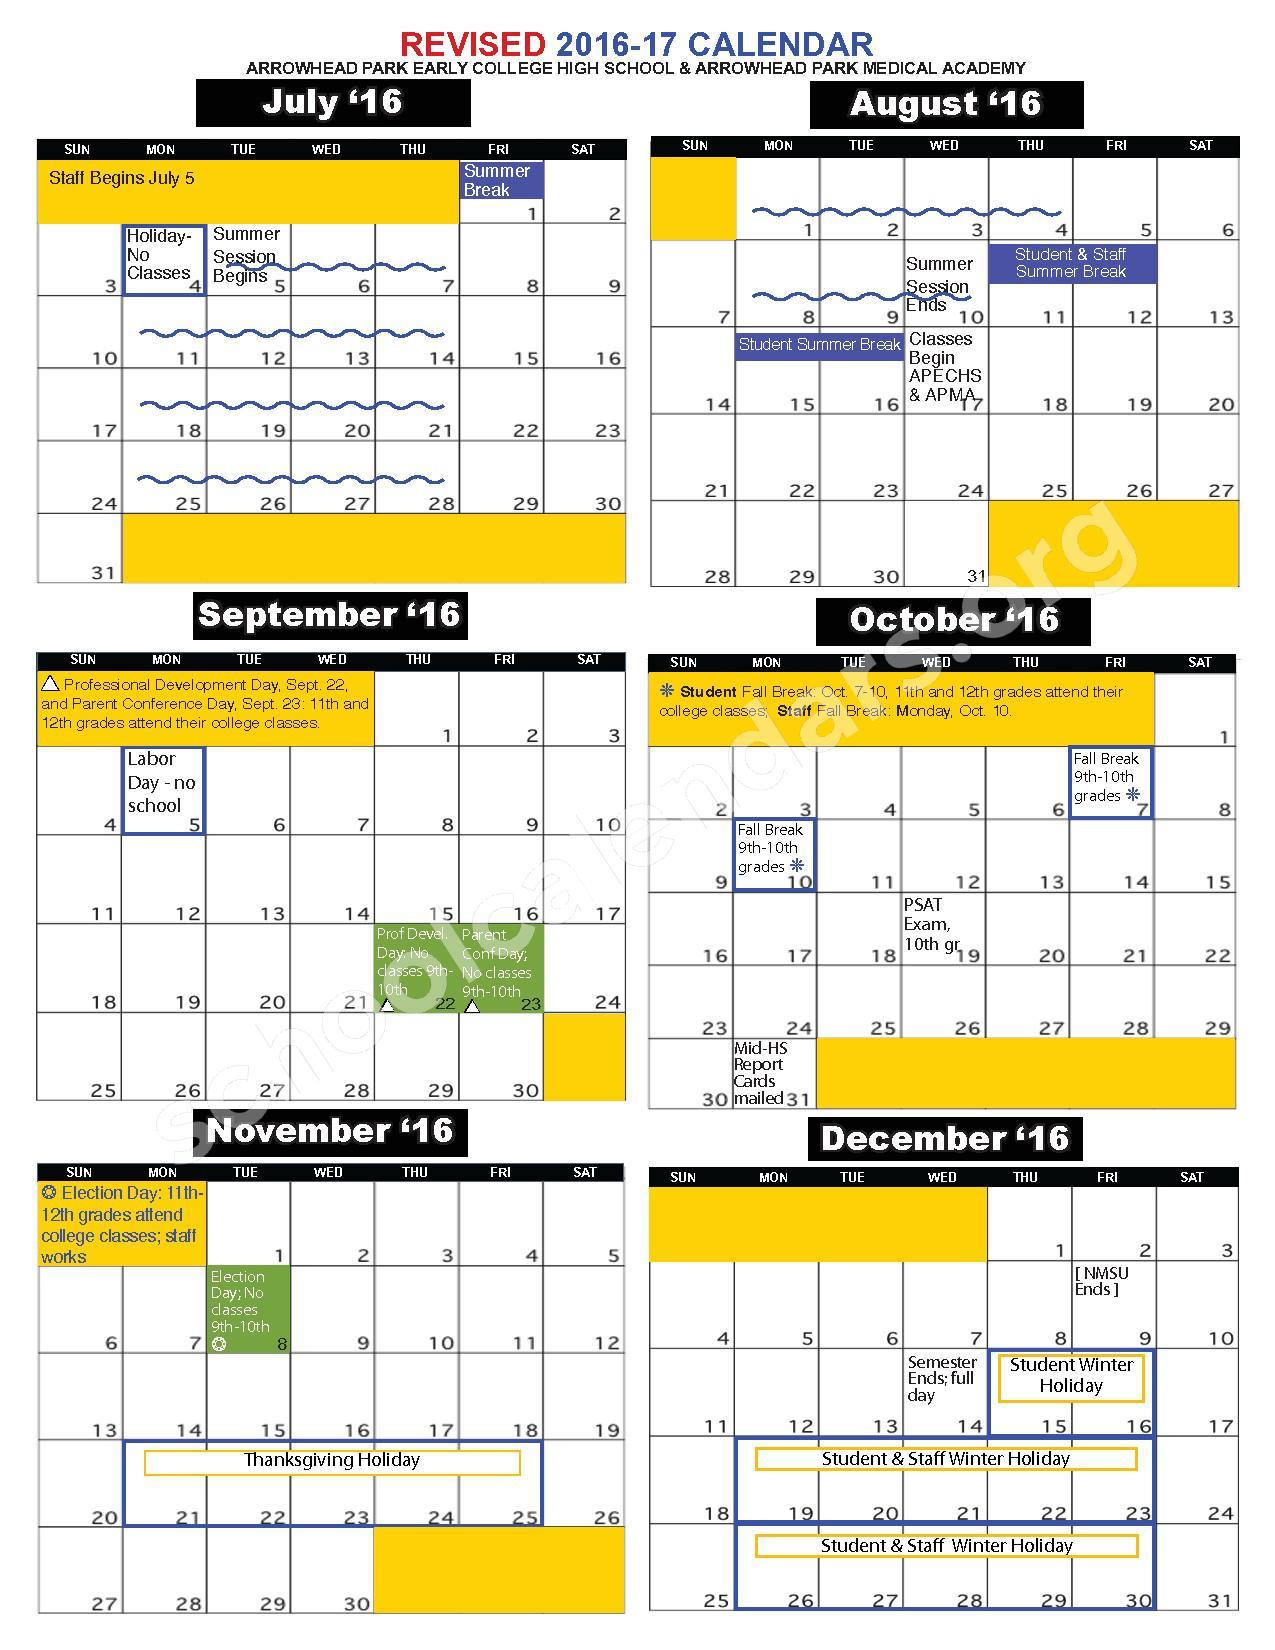 Uri Academic Calendar Holiday | Printable Calendar 2020 2021 Pertaining To Merced City School District Calendar